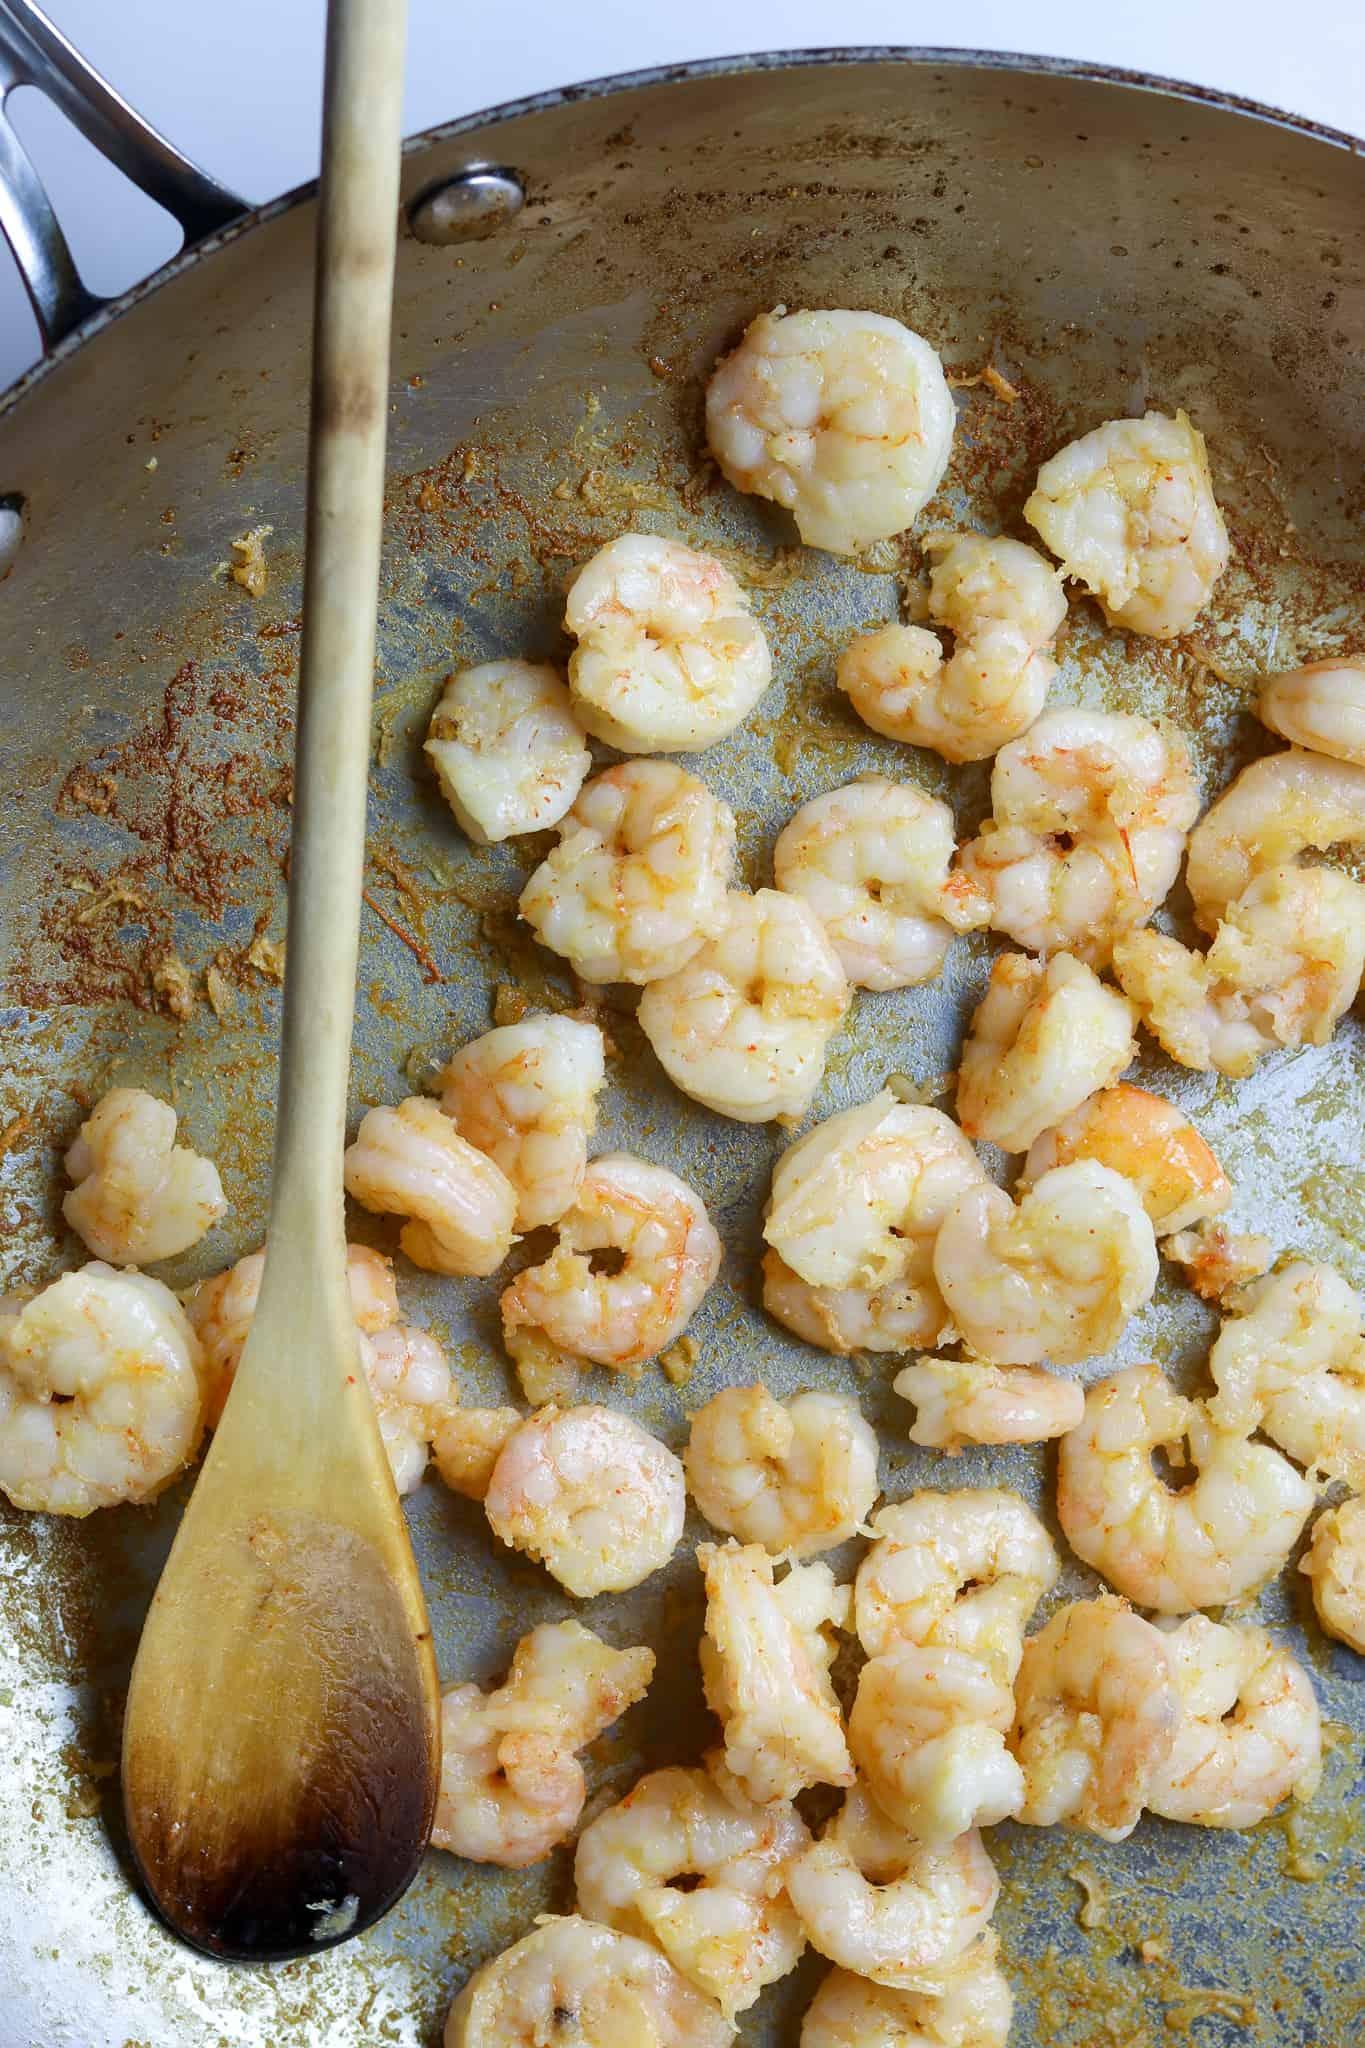 A pan of sautéed shrimp with a wooden spoon.